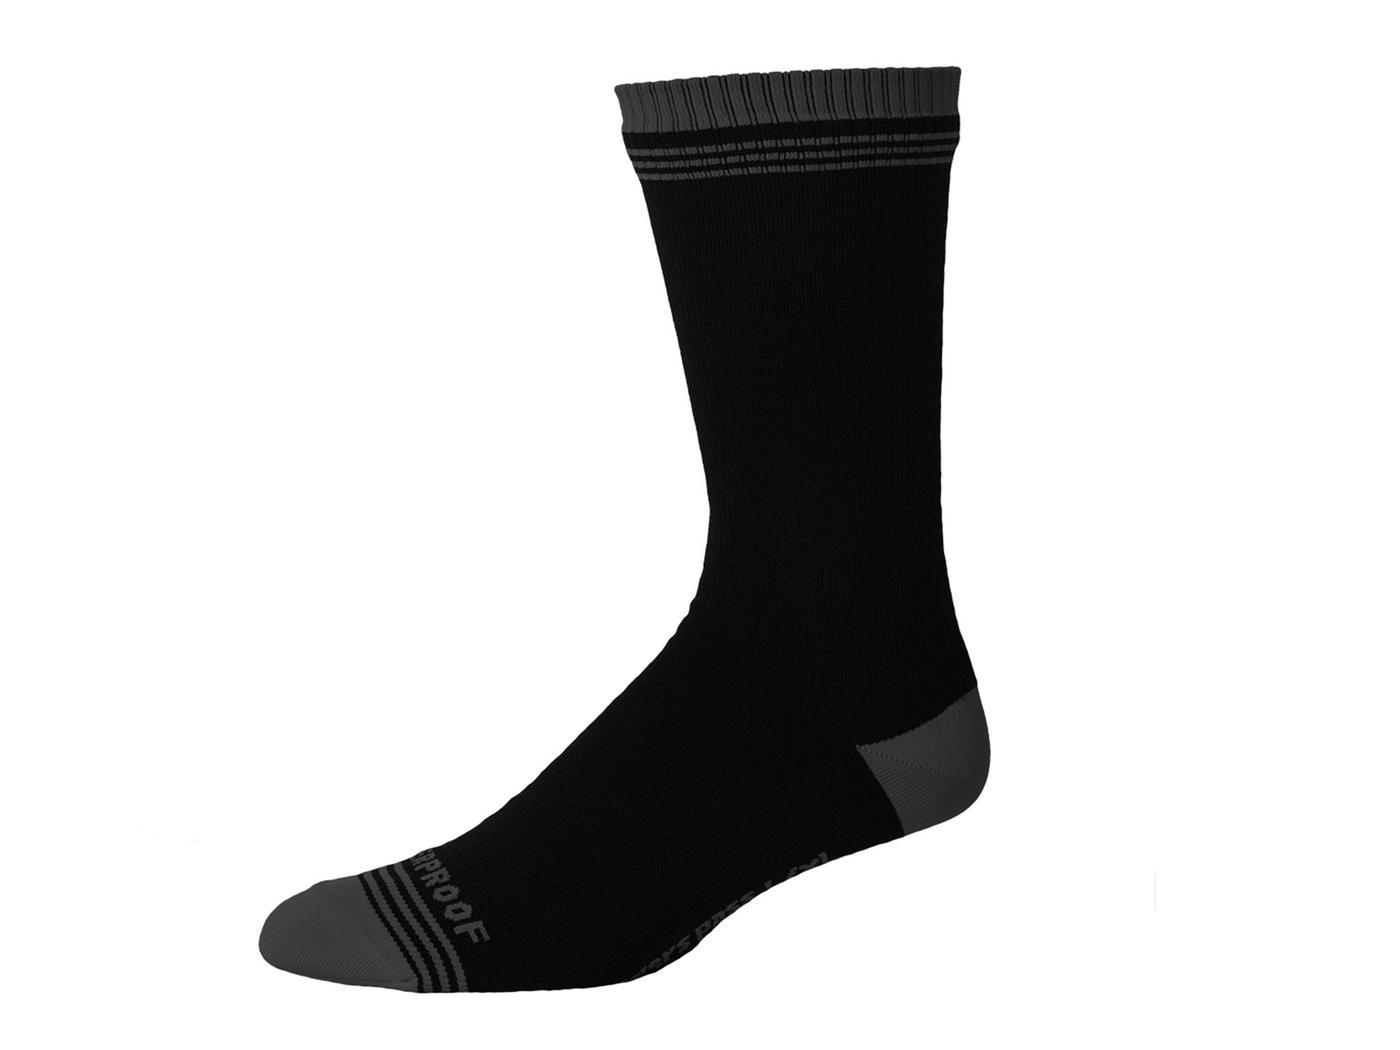 Showers Pass: Crosspoint Waterproof Socks